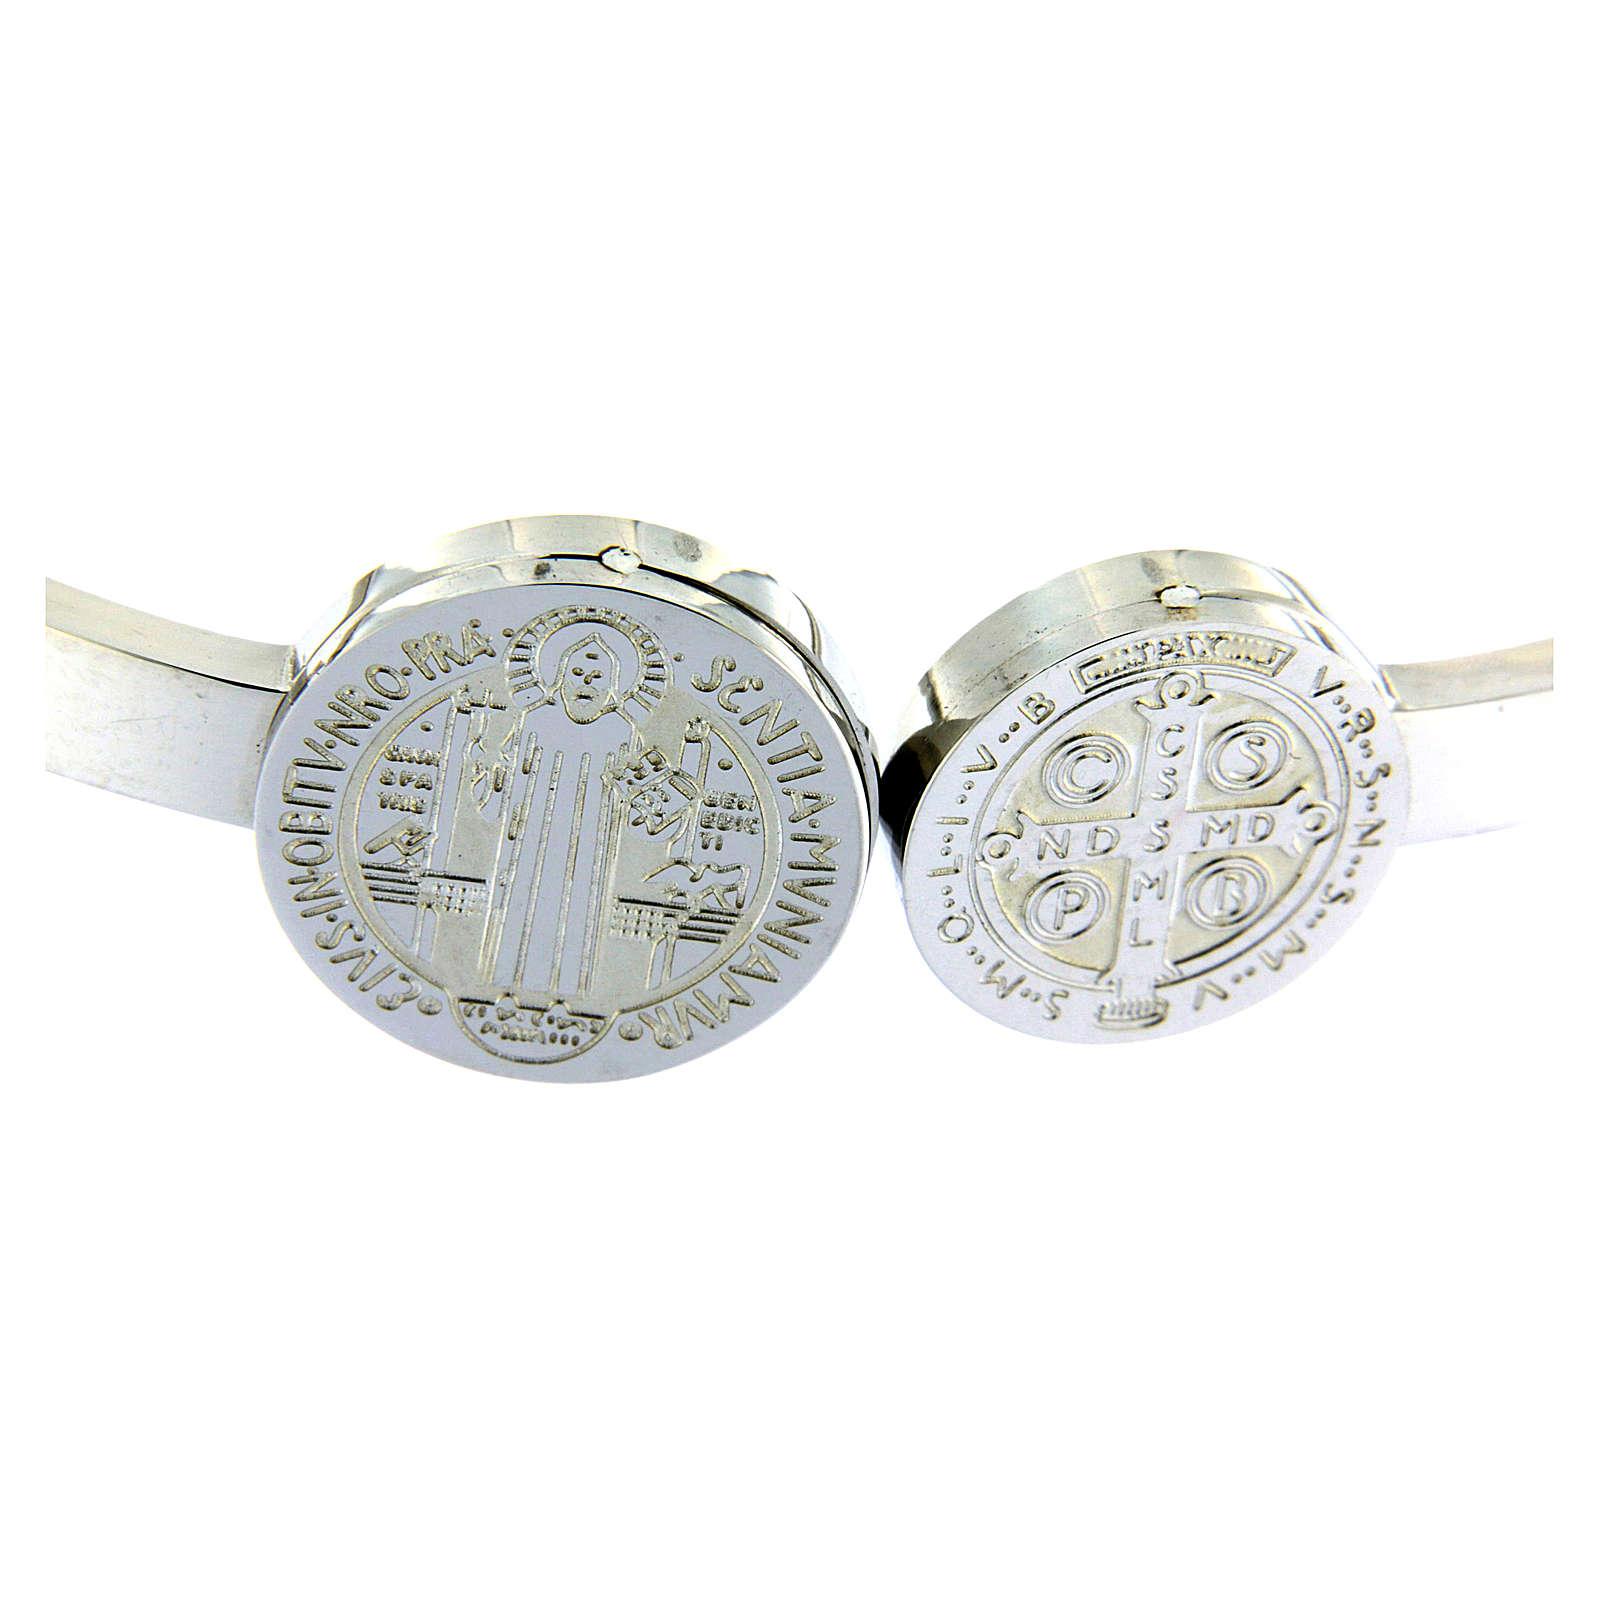 Bracelet Medjugorje médailles St Benoît et croix ressort 4